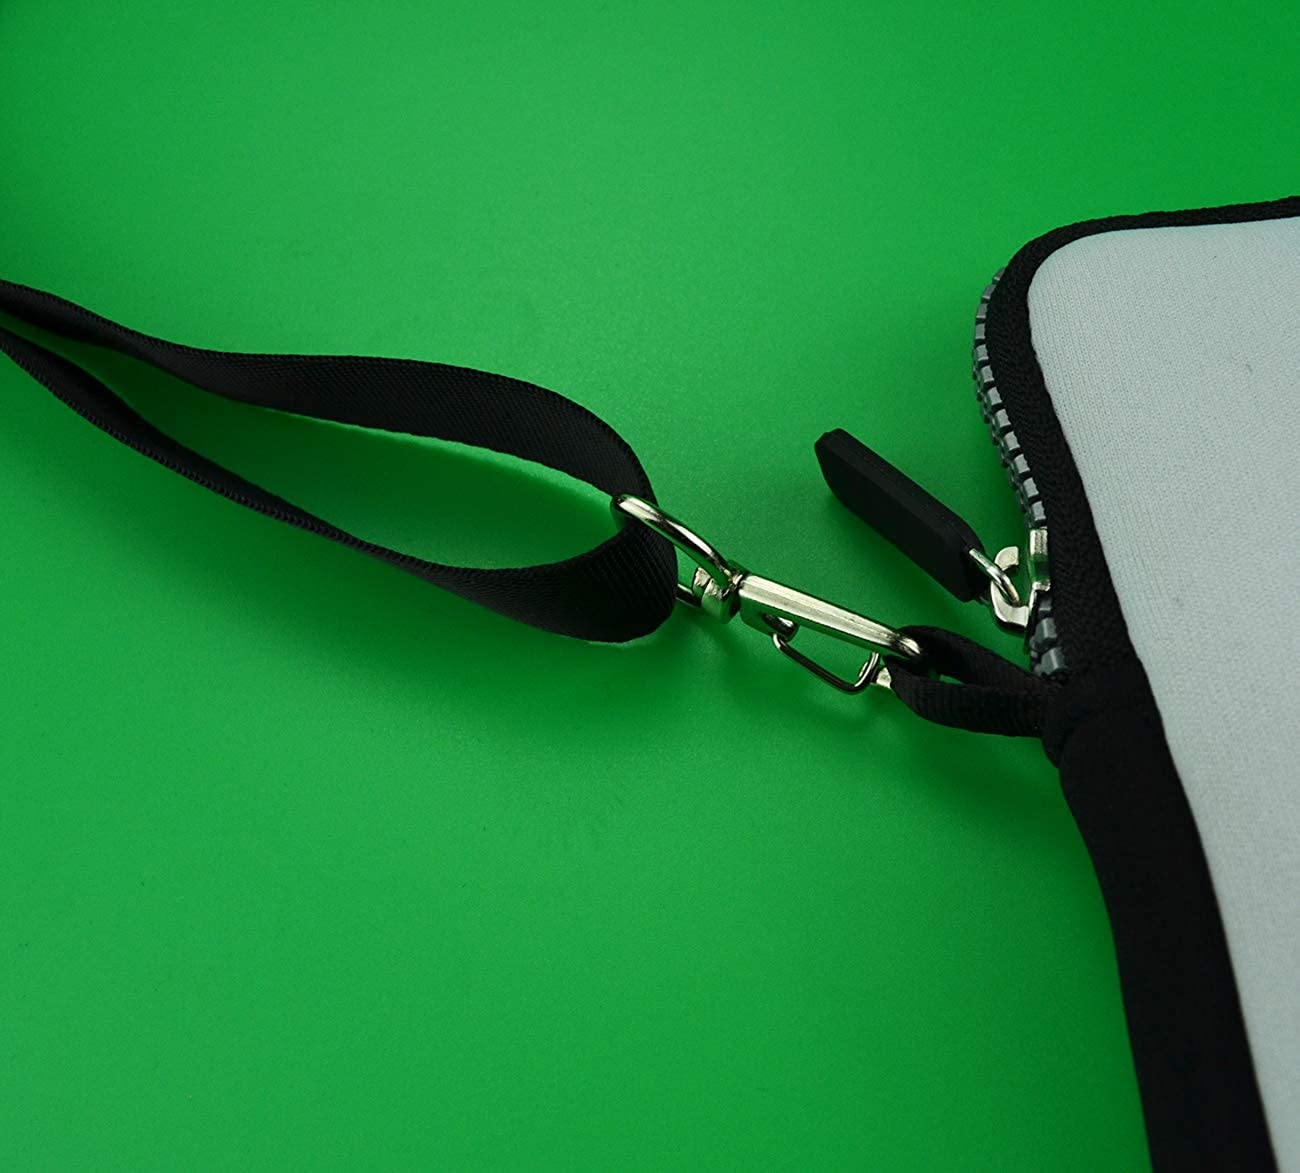 Iphone Hip Pop Multifunctional Big Tiger Holder For 6 Inch Cell Phones with Adjustable Shoulder Strap Storage Organizer Wristlet Convertible Bag